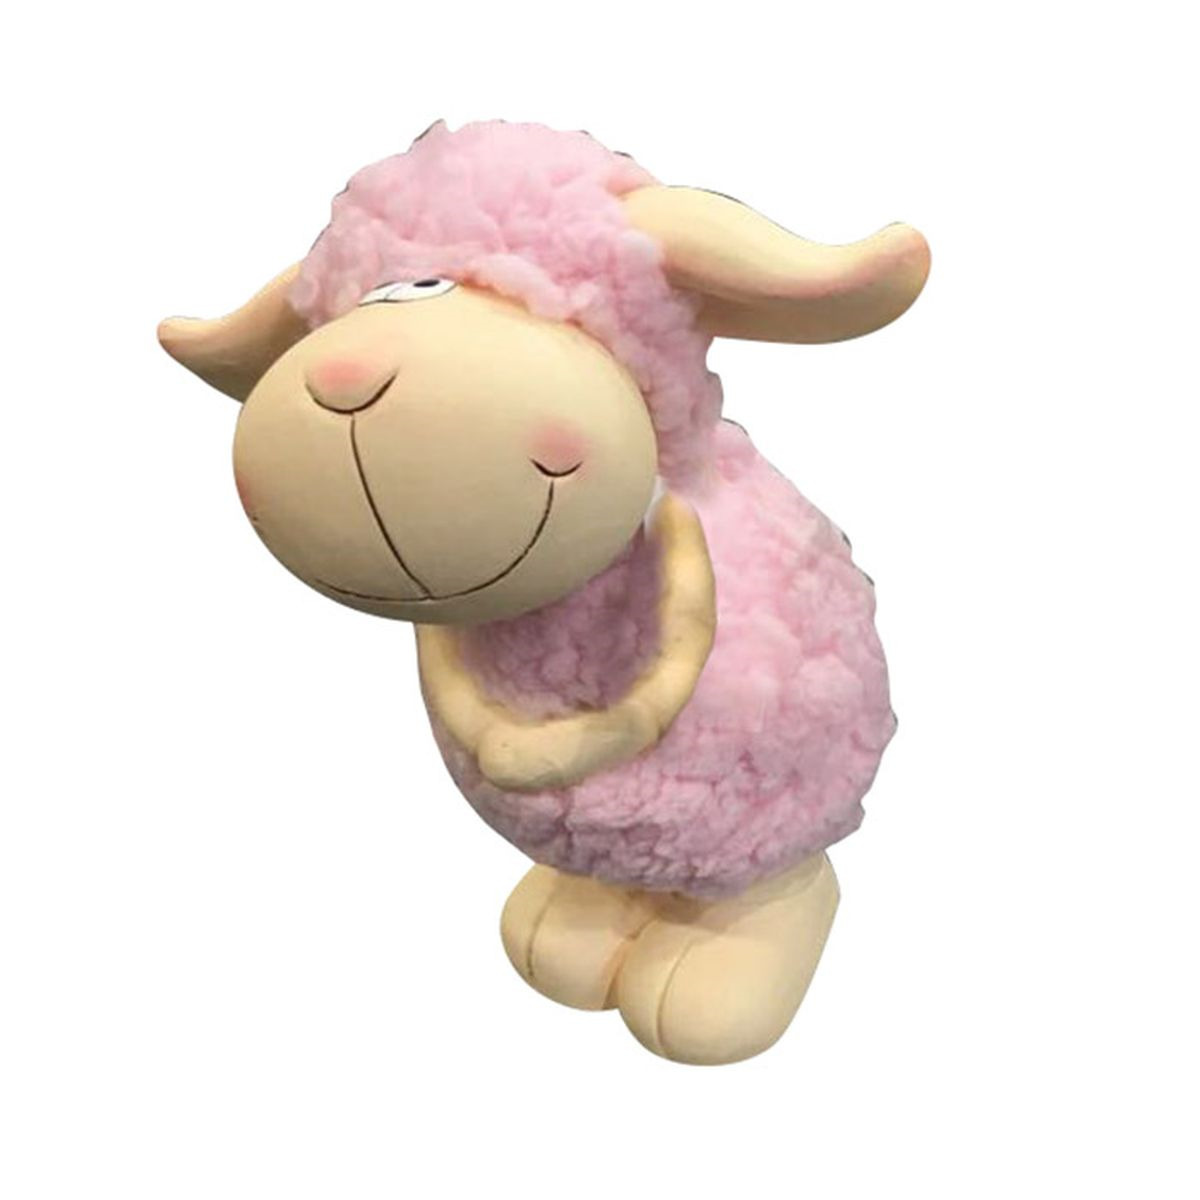 Фигурка декоративная Village People Улыбчивая овечка, бежевый, розовый, 23,5 х 17 х 16 см цены онлайн